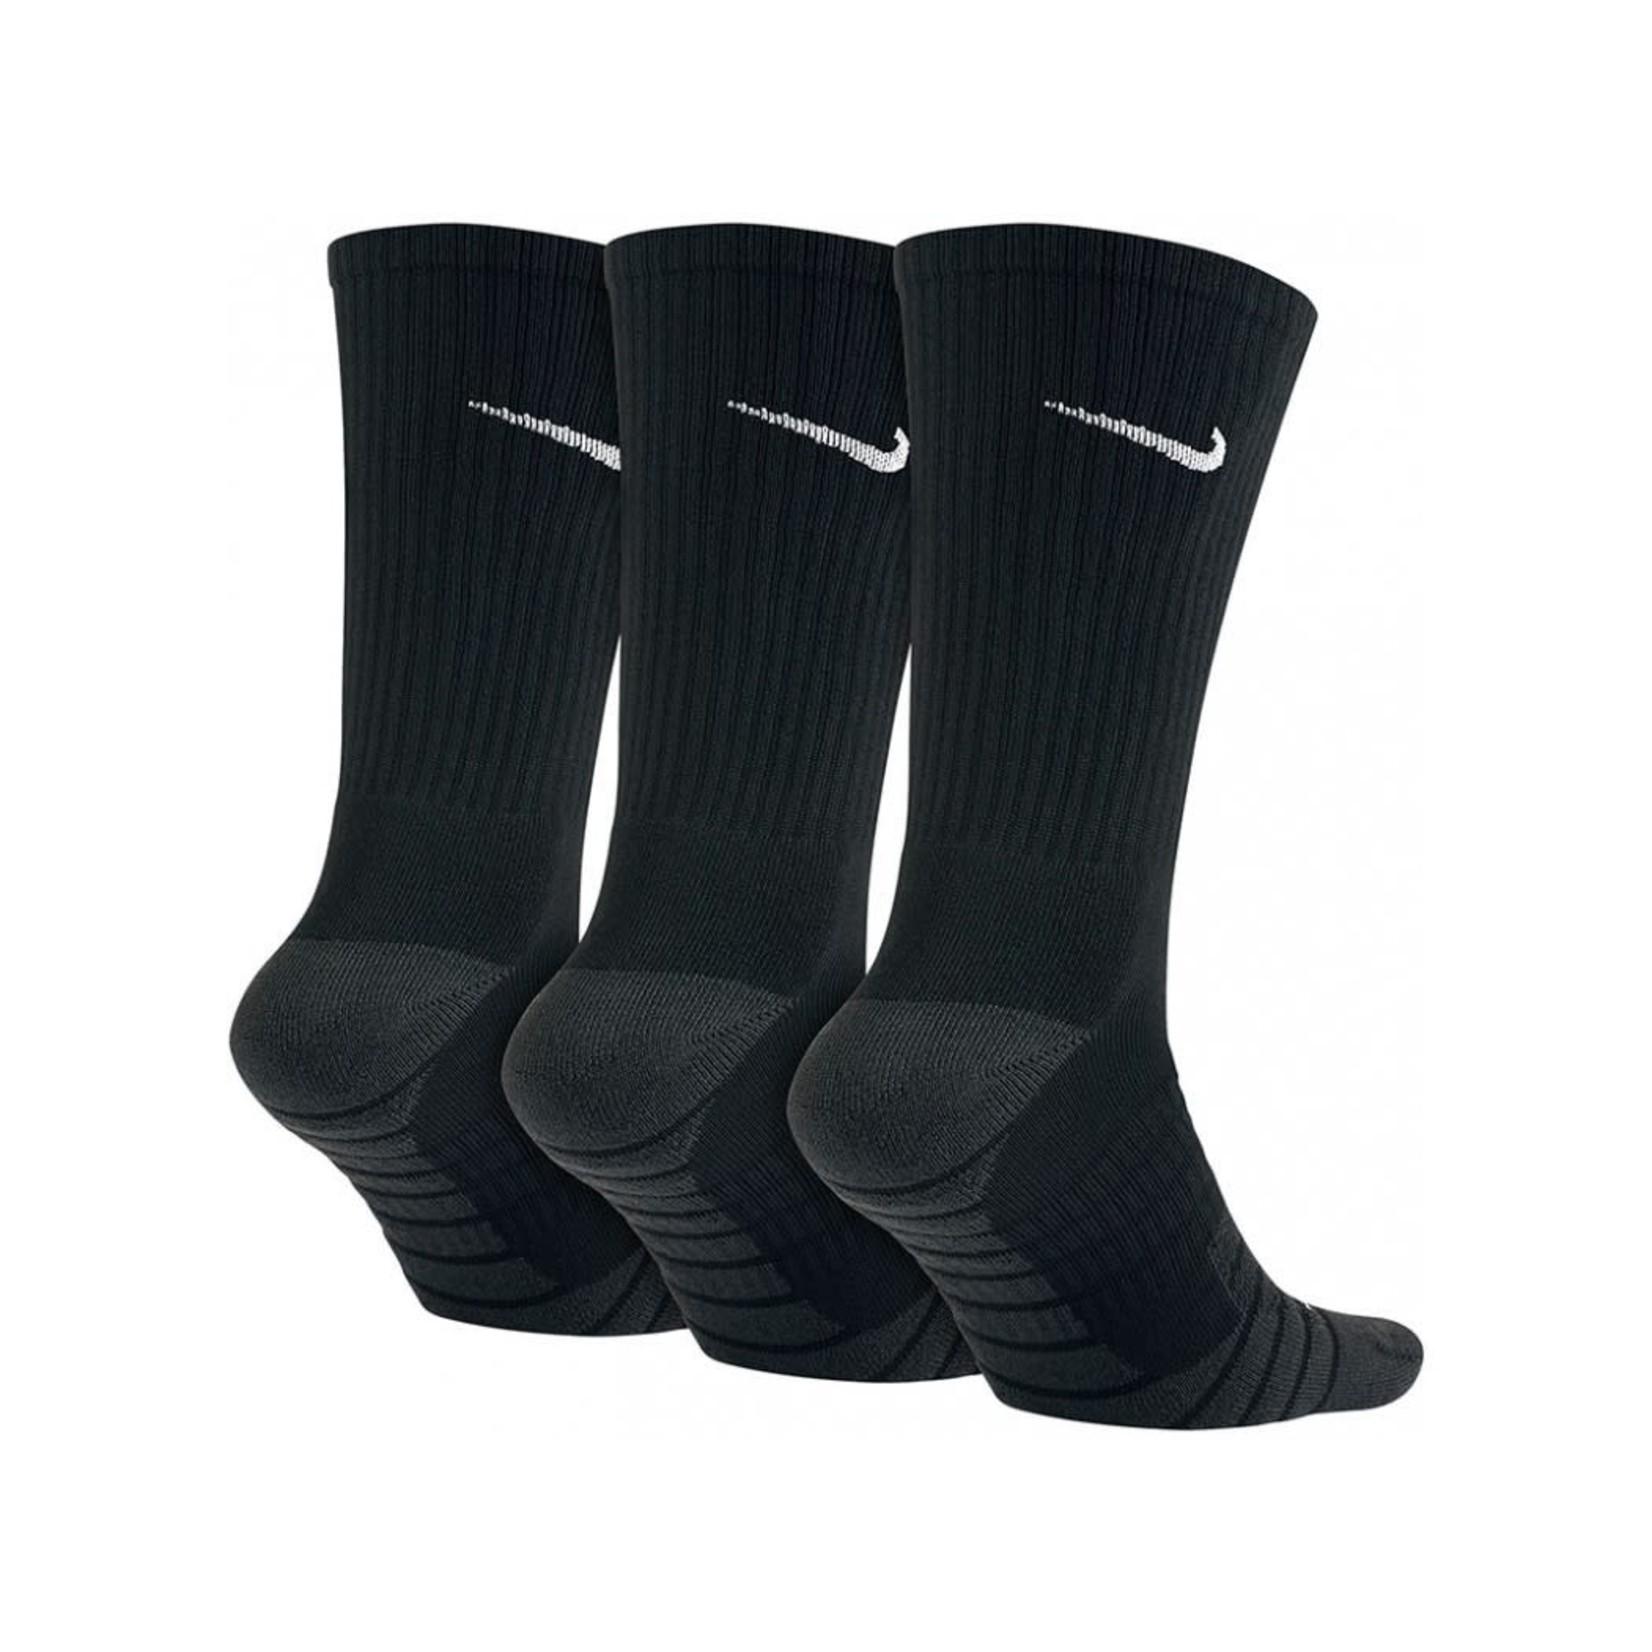 Nike 3 Pack Cushion Dri-Fit Sportsok